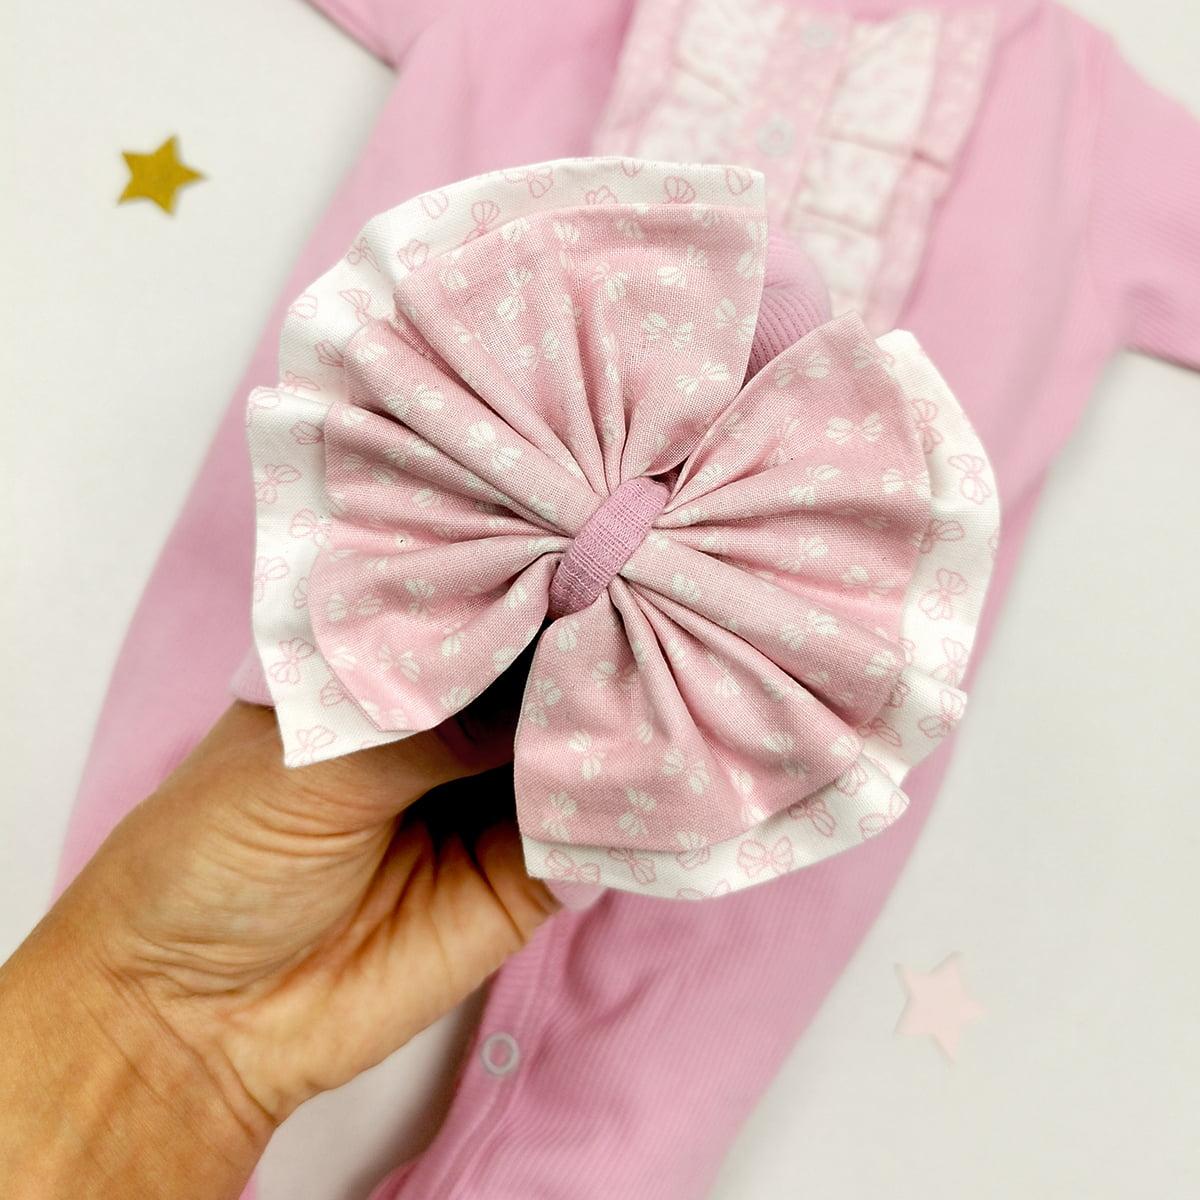 mašnica rozog kompleta za bebe